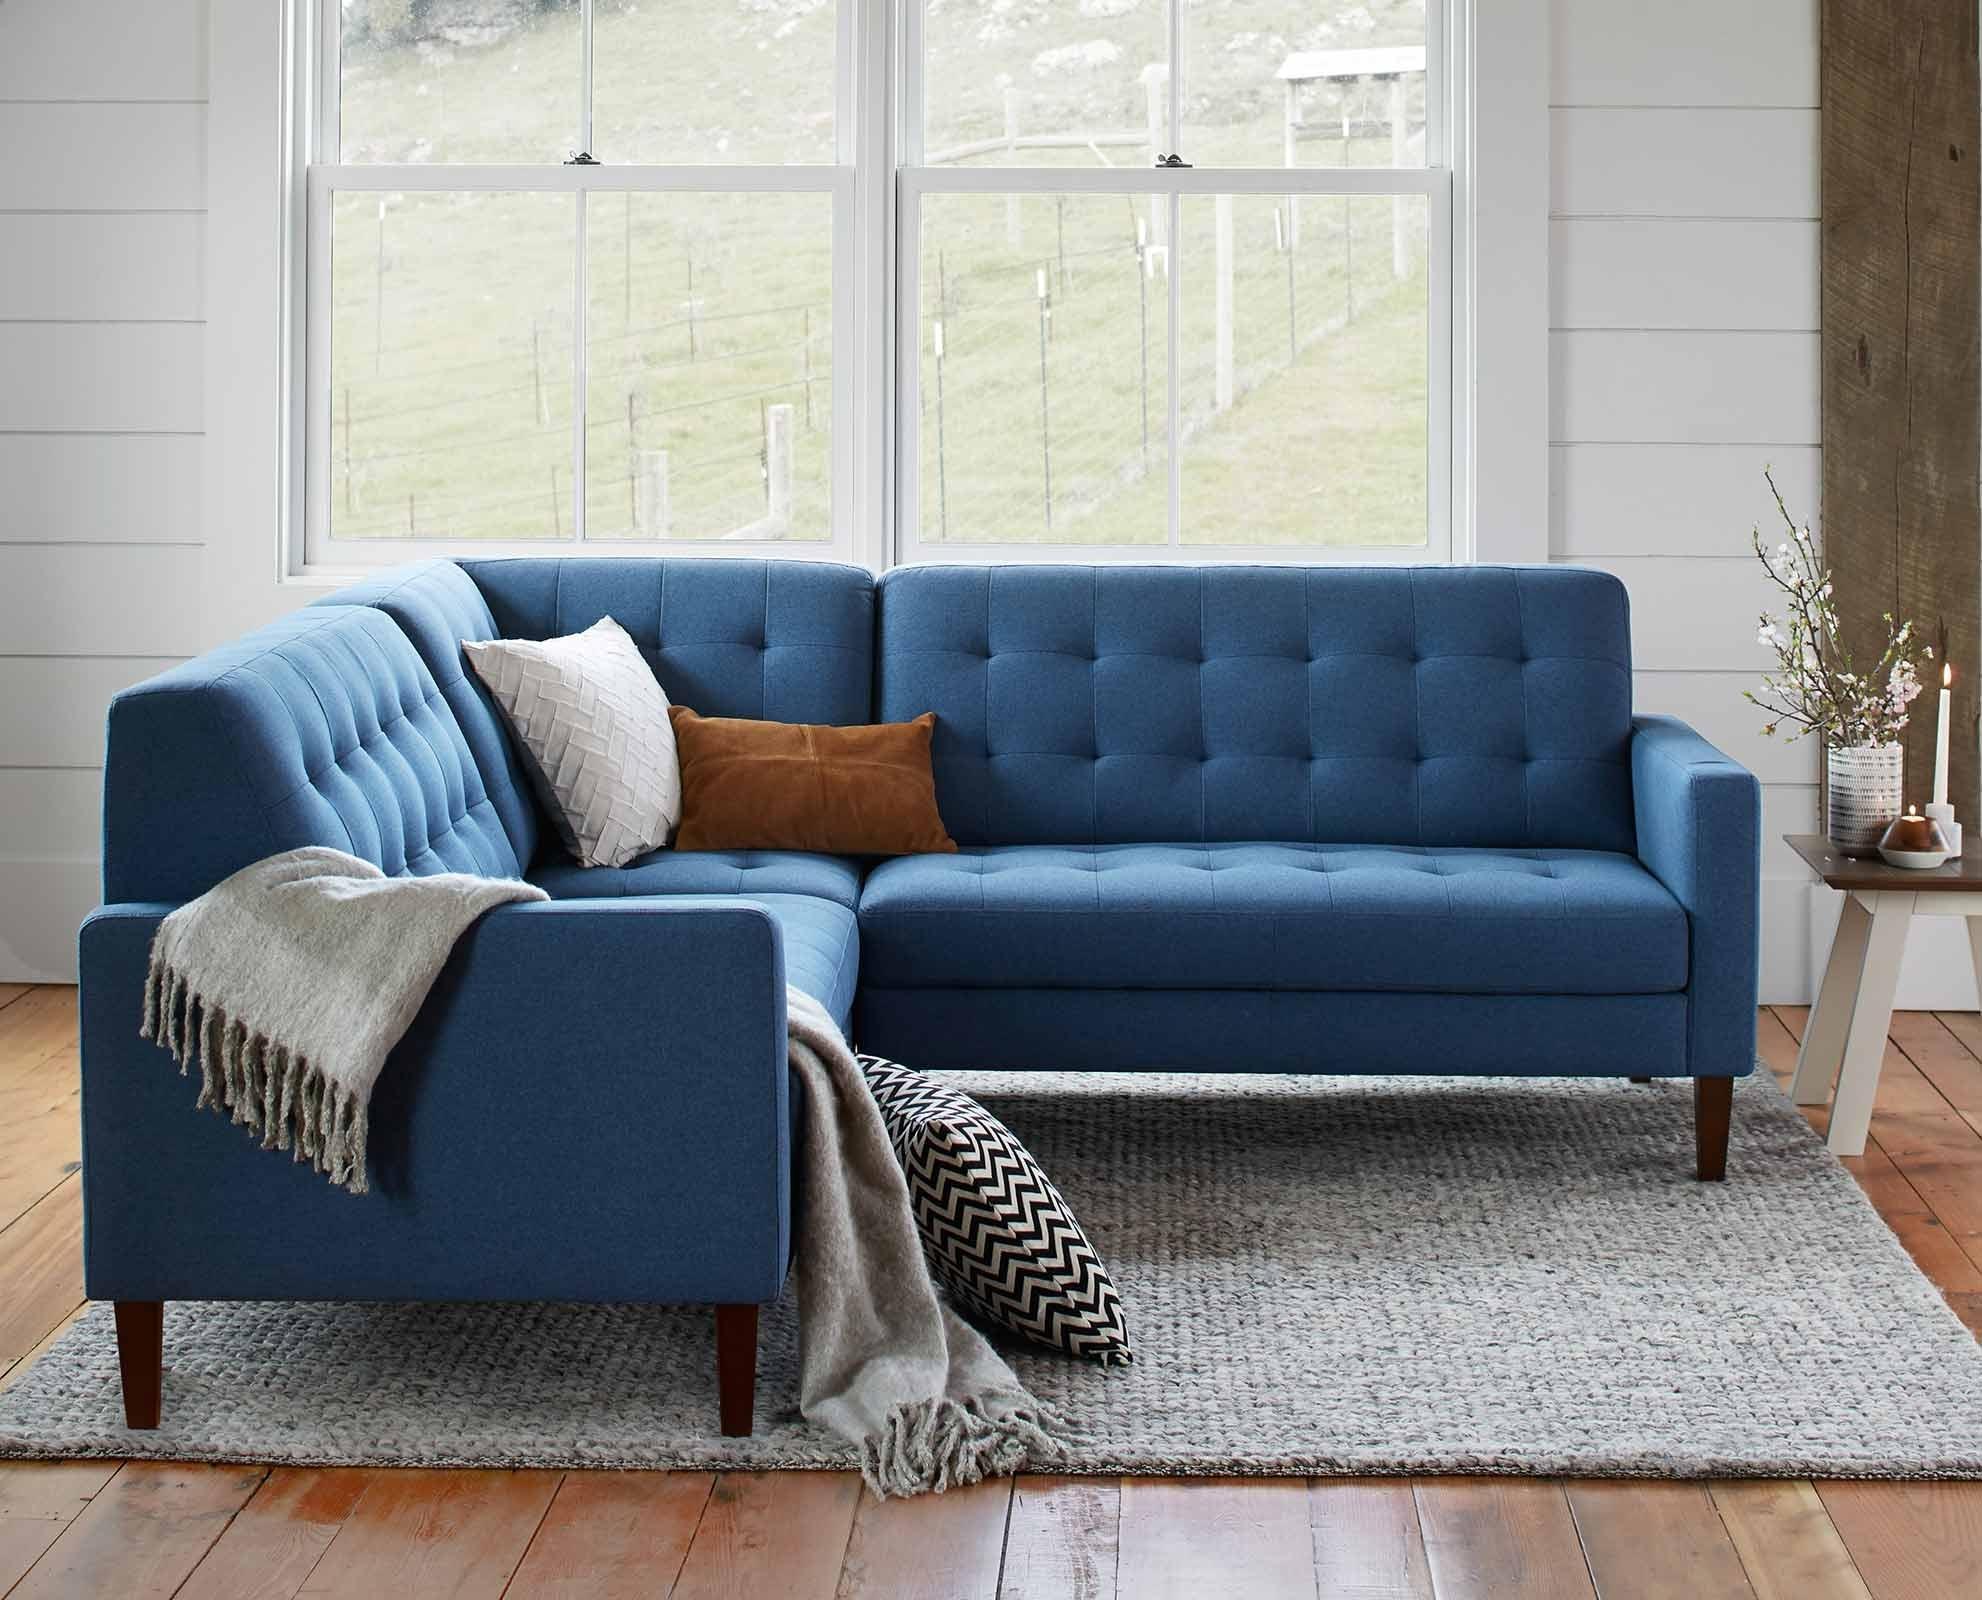 68 Inch Sofa Sleeper Urban Home Designing Trends